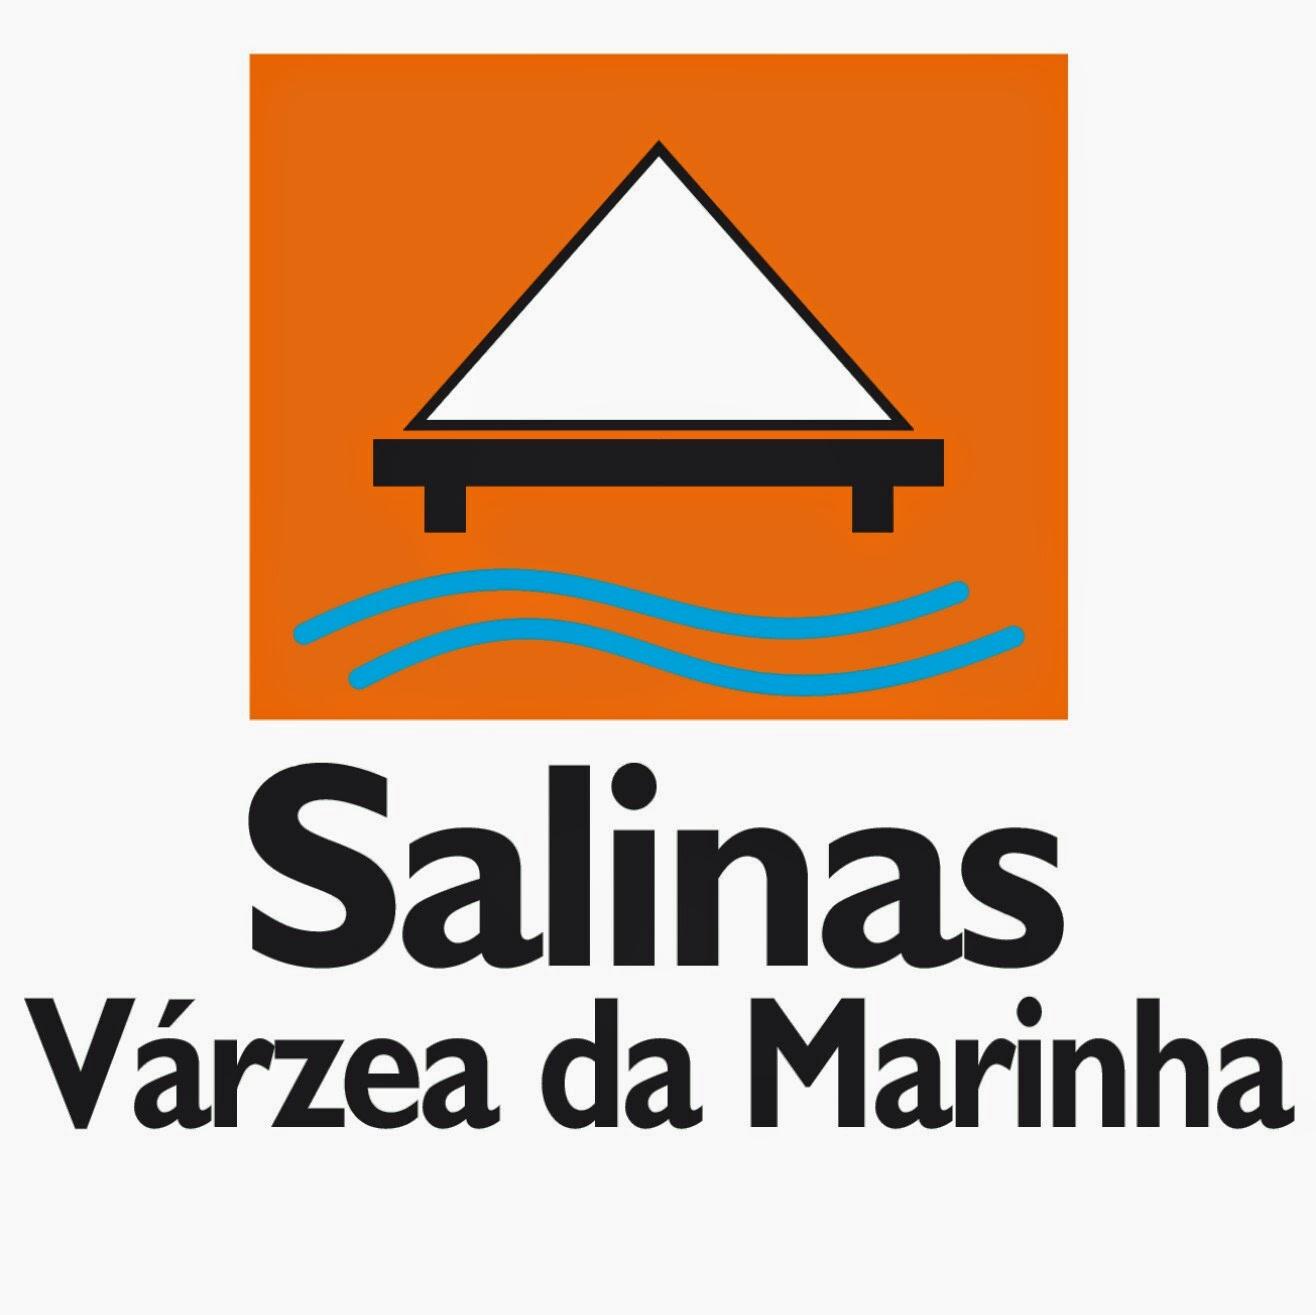 Salinas Varzea da Marinha